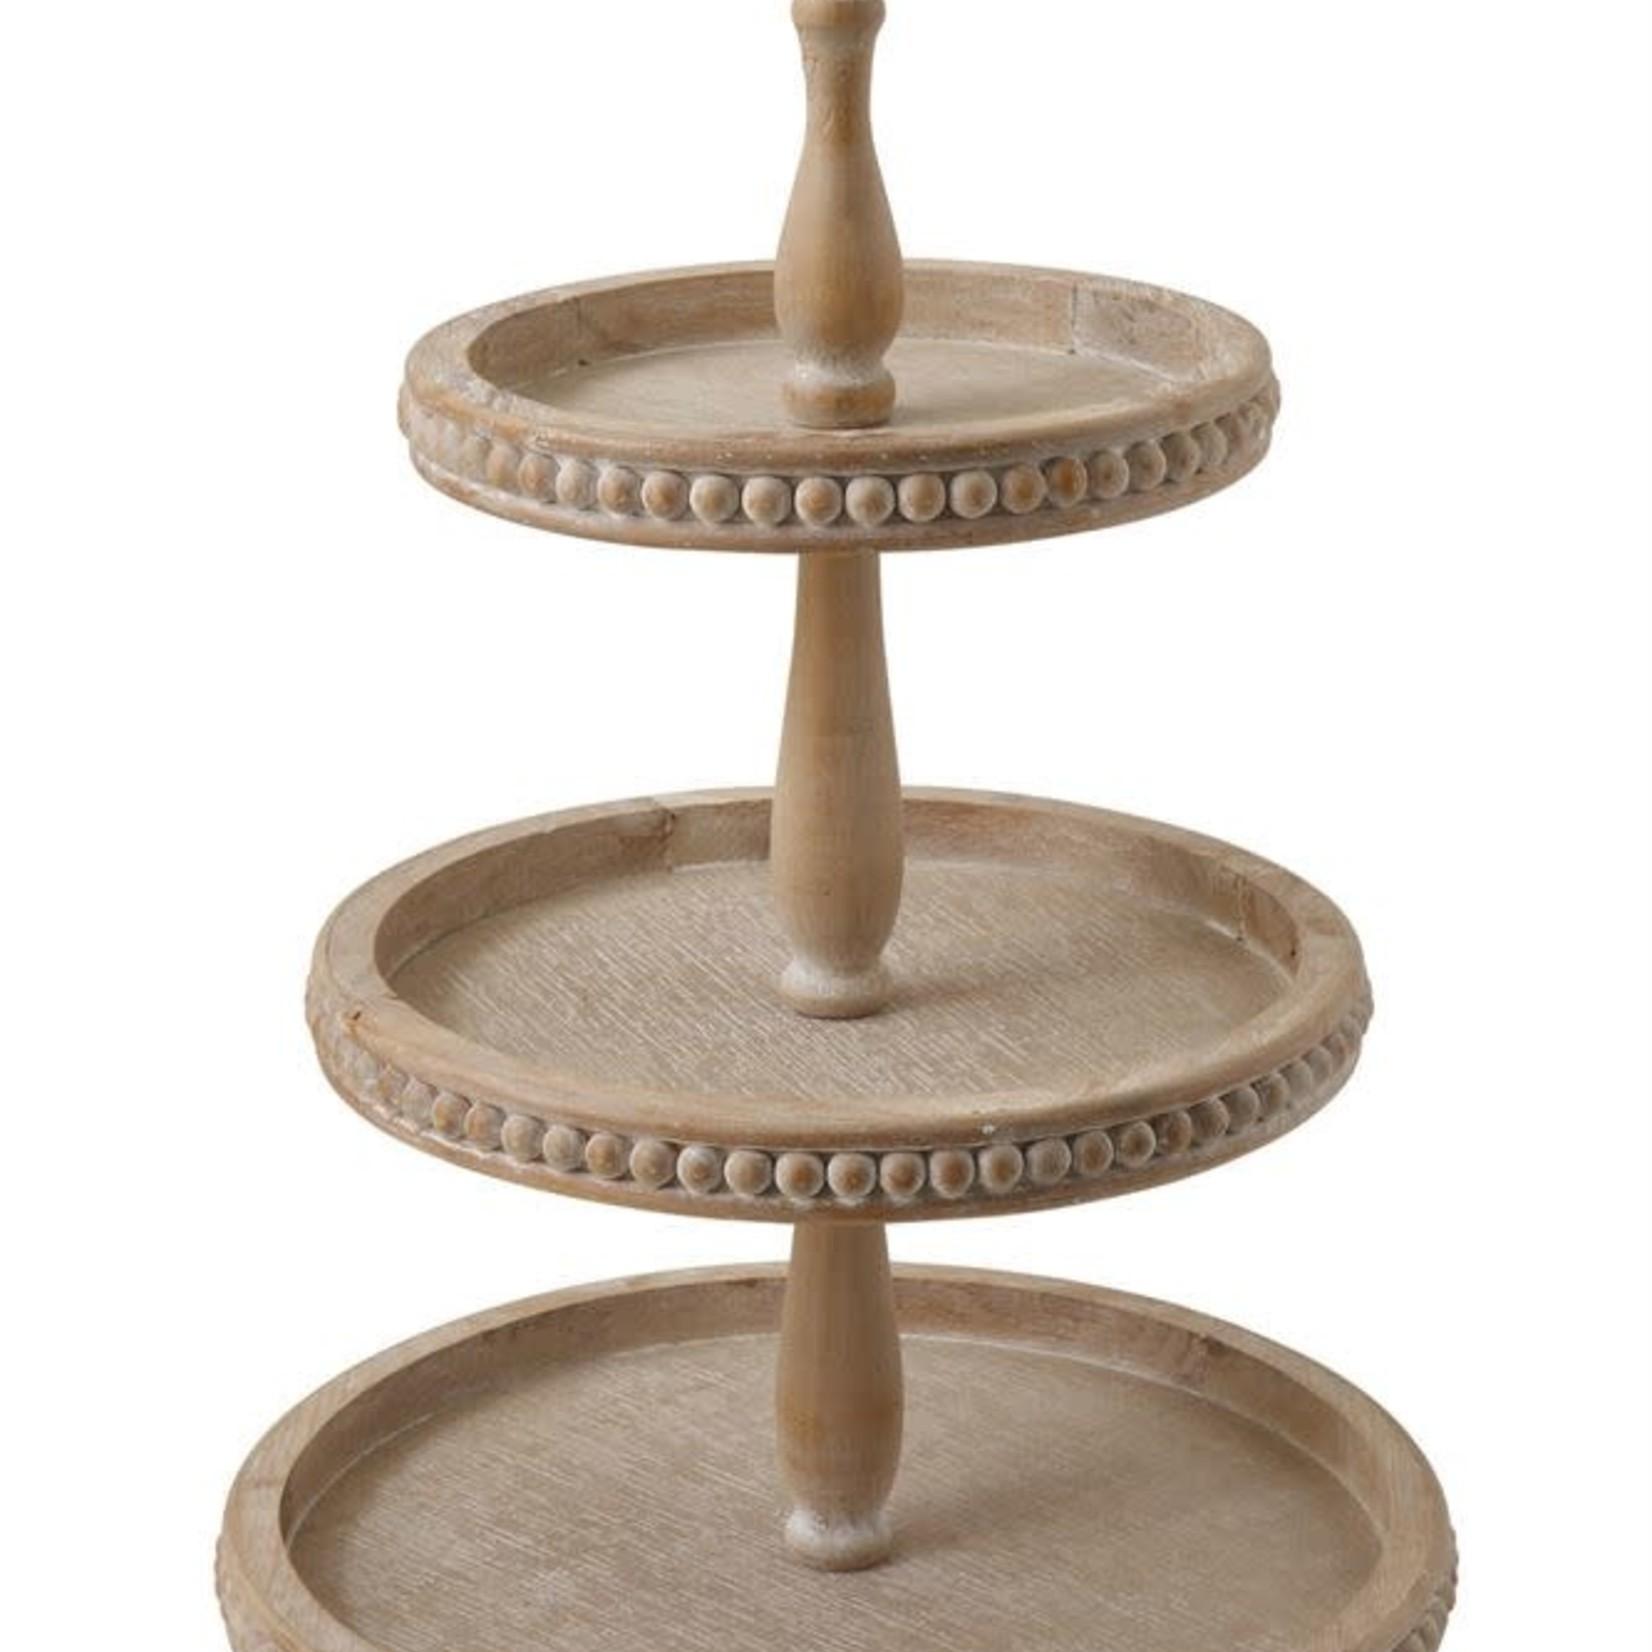 Decorative Wood 3-Tier Tray Light